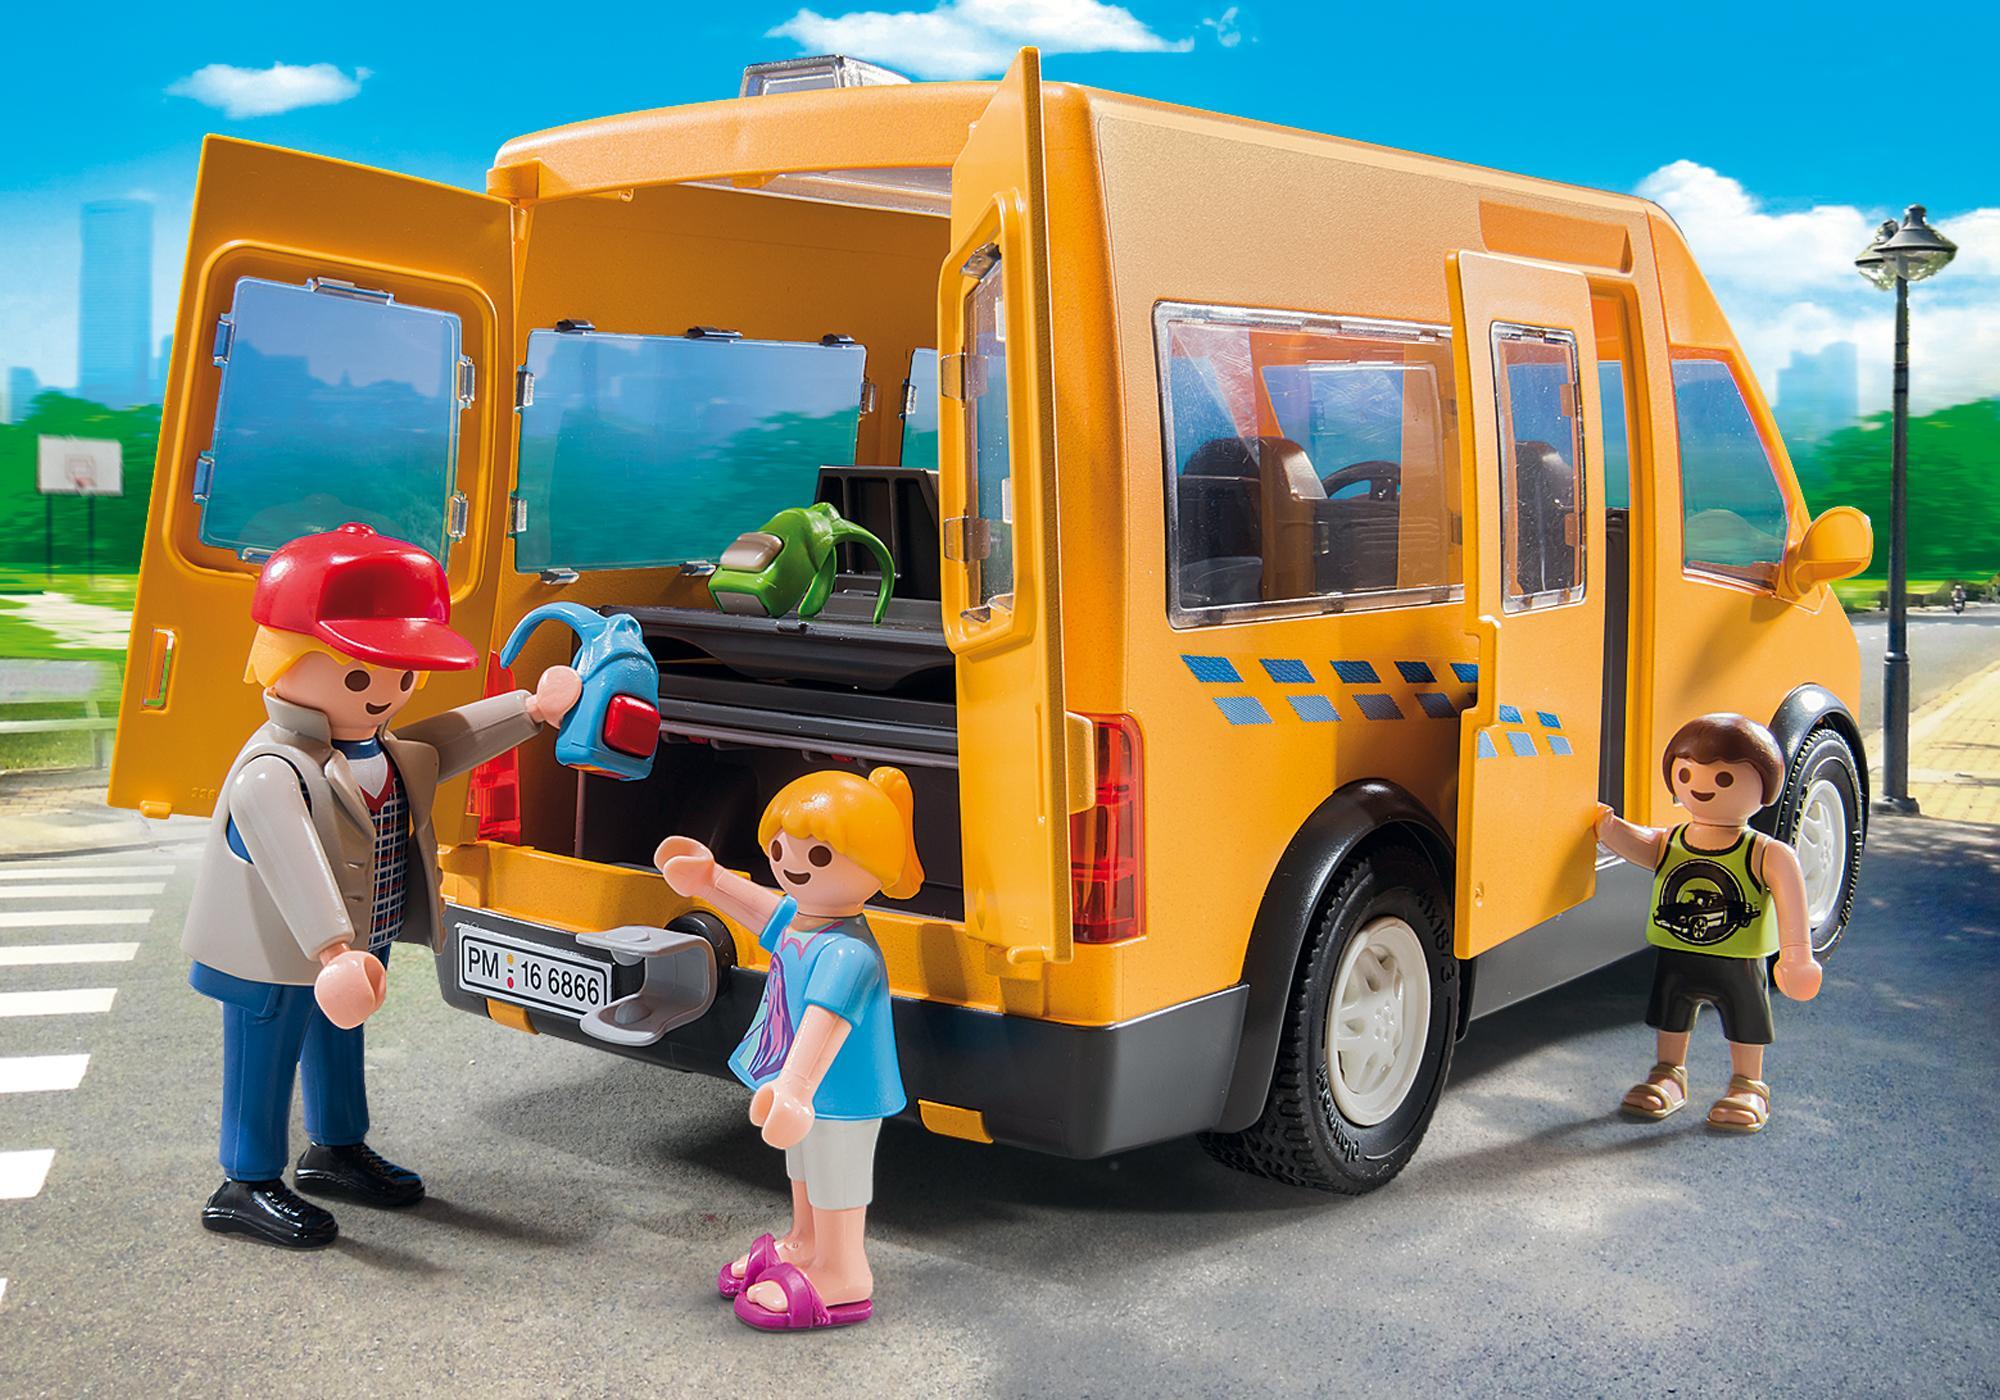 http://media.playmobil.com/i/playmobil/6866_product_extra1